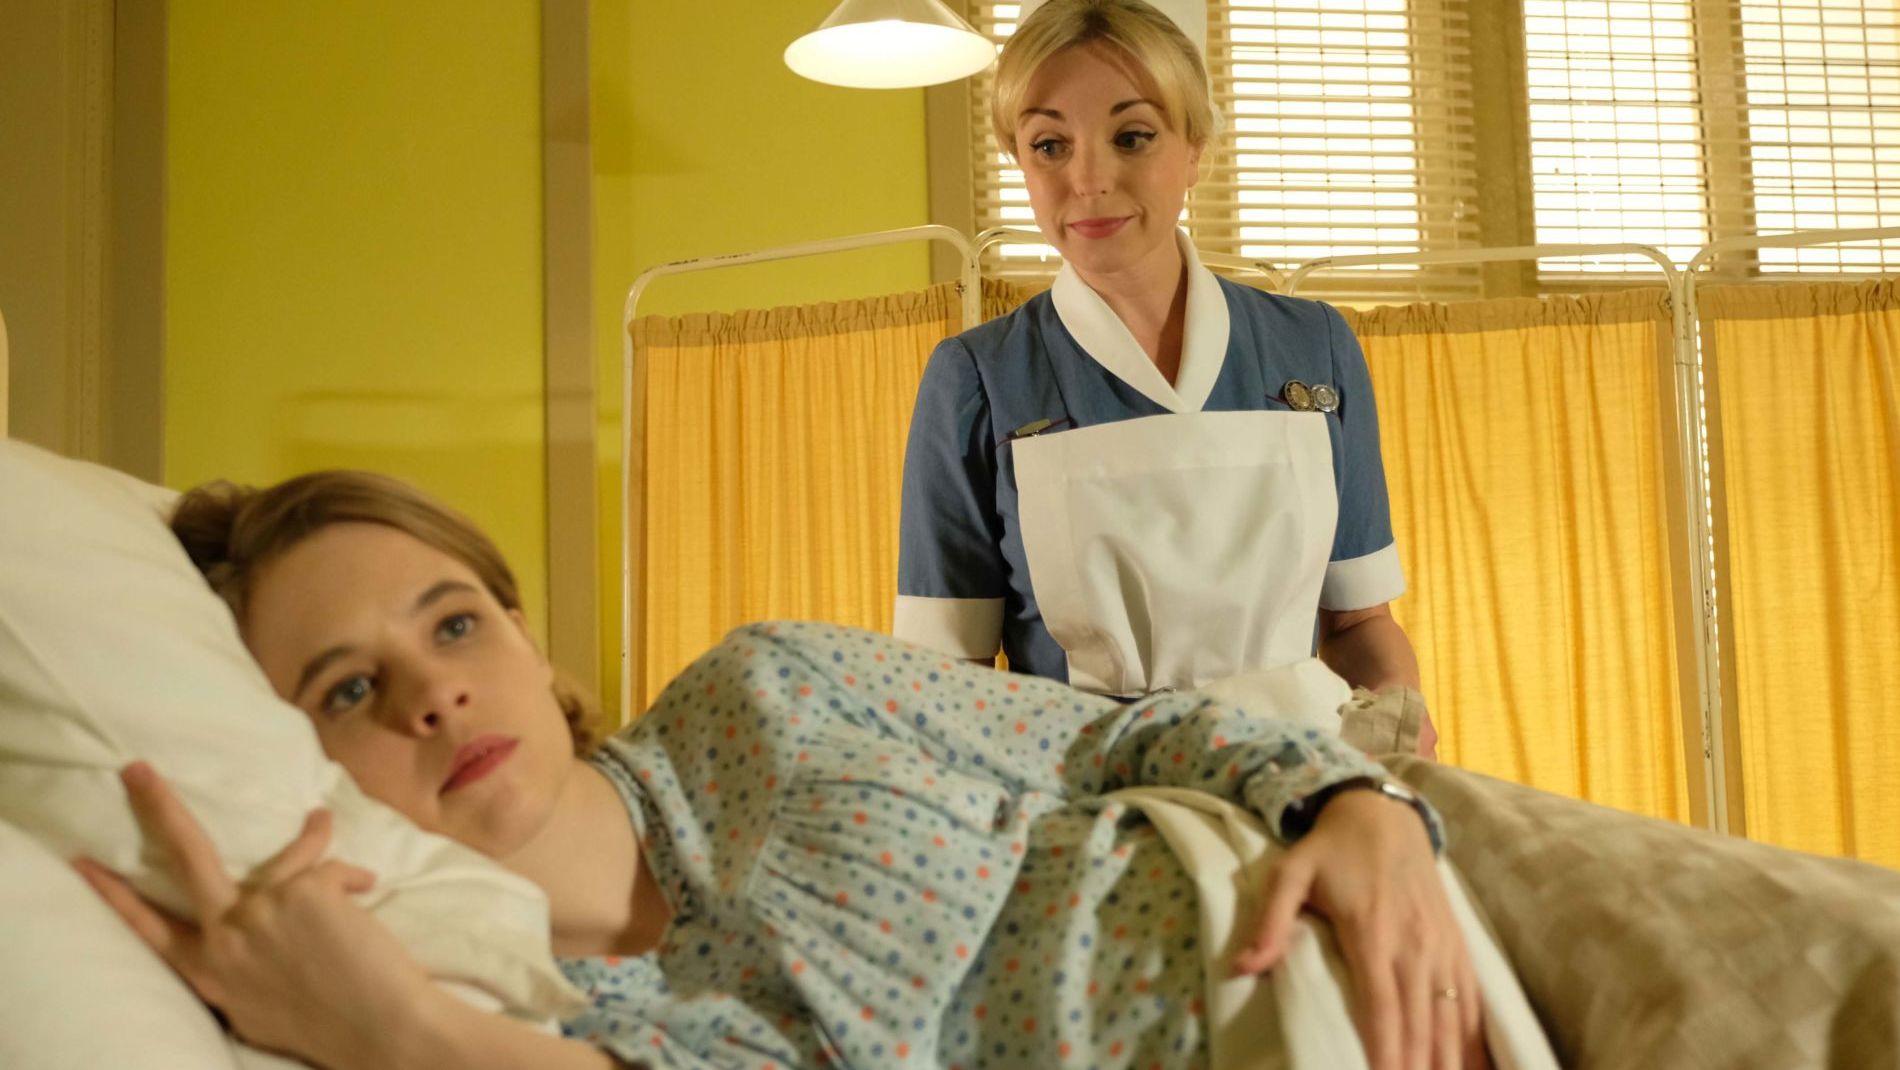 Nurse Trixie Franklin (Helen George) helps the pregnant Mrs. Lombardi (Jessica Clark).